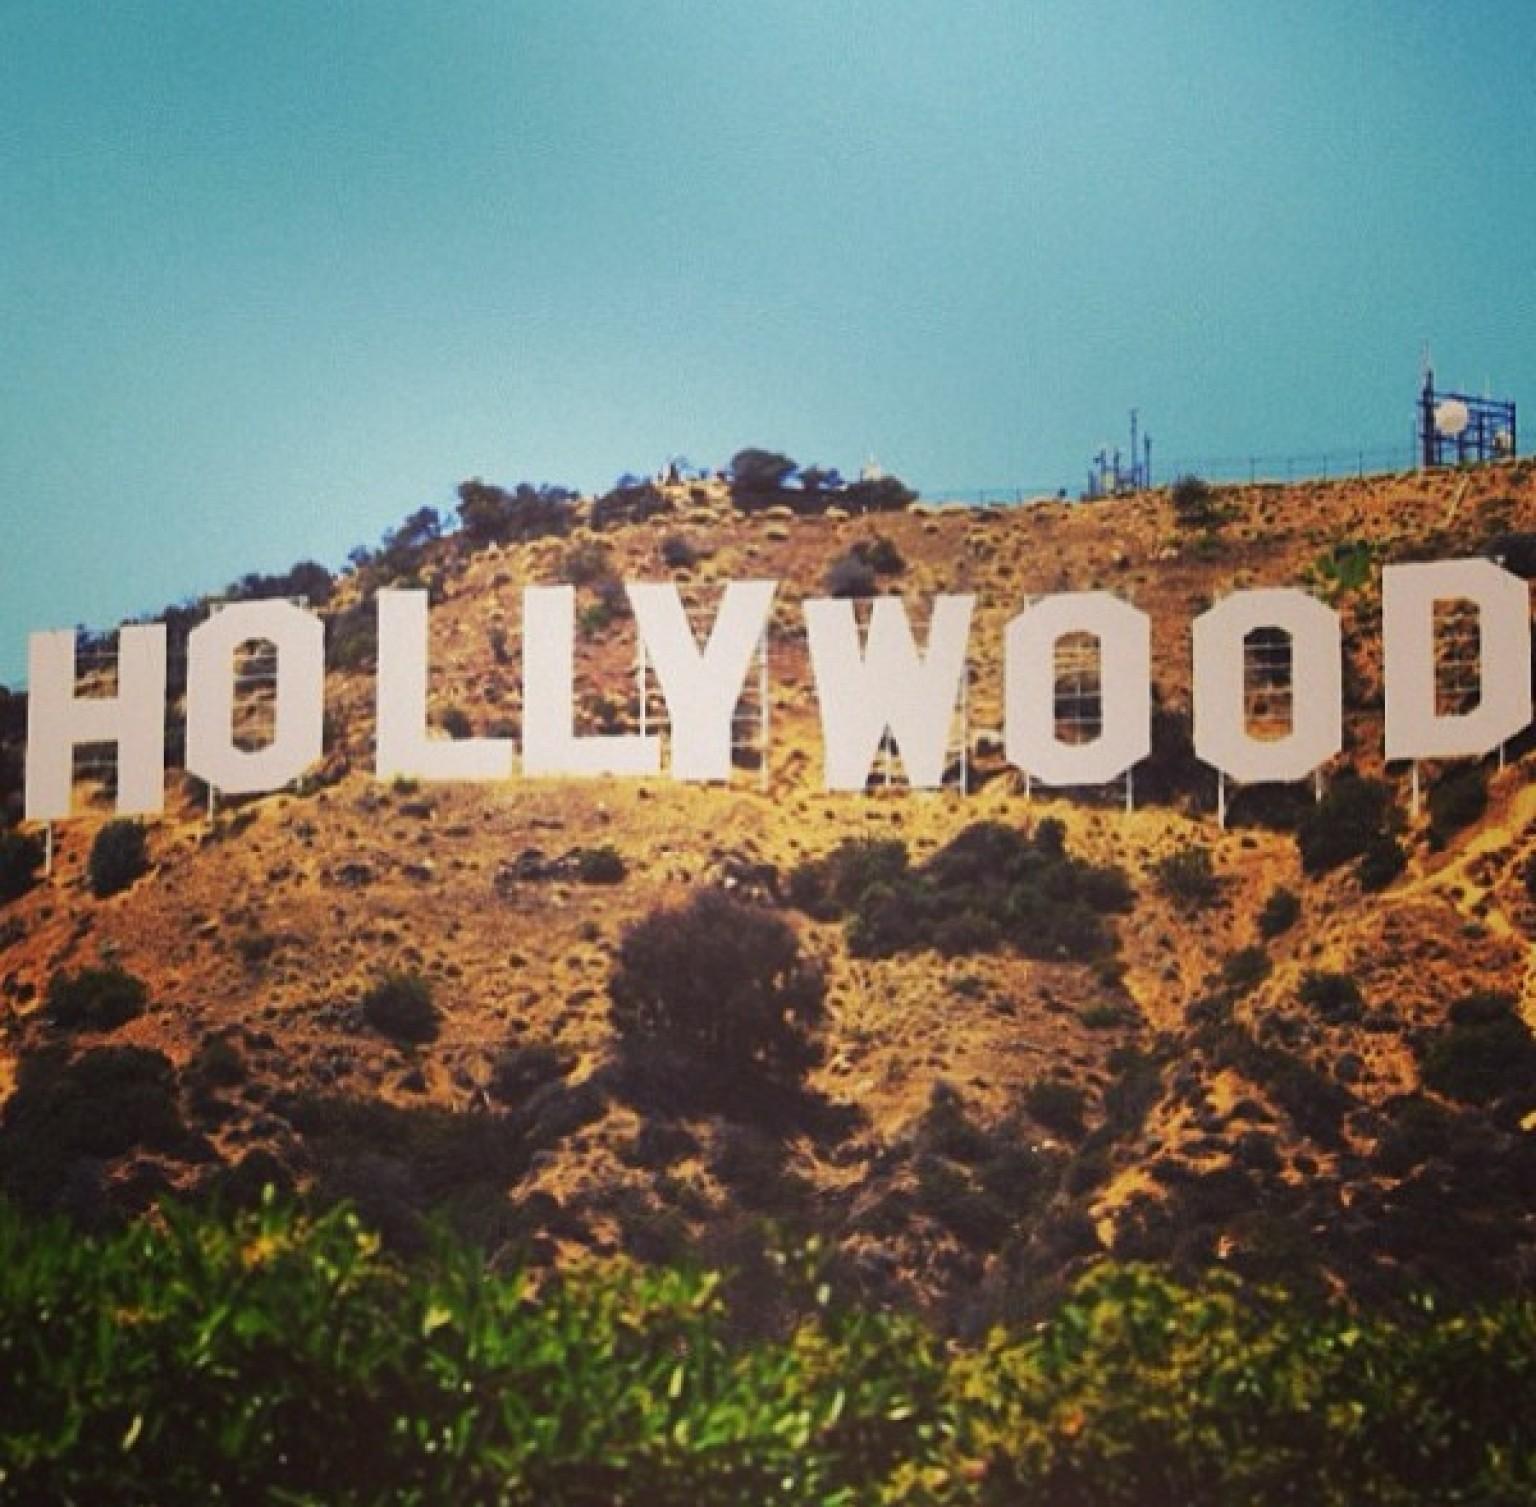 Http Www Huffingtonpost Com 2013 08 07 La Landmark Instagram Destinations N 3685386 Html